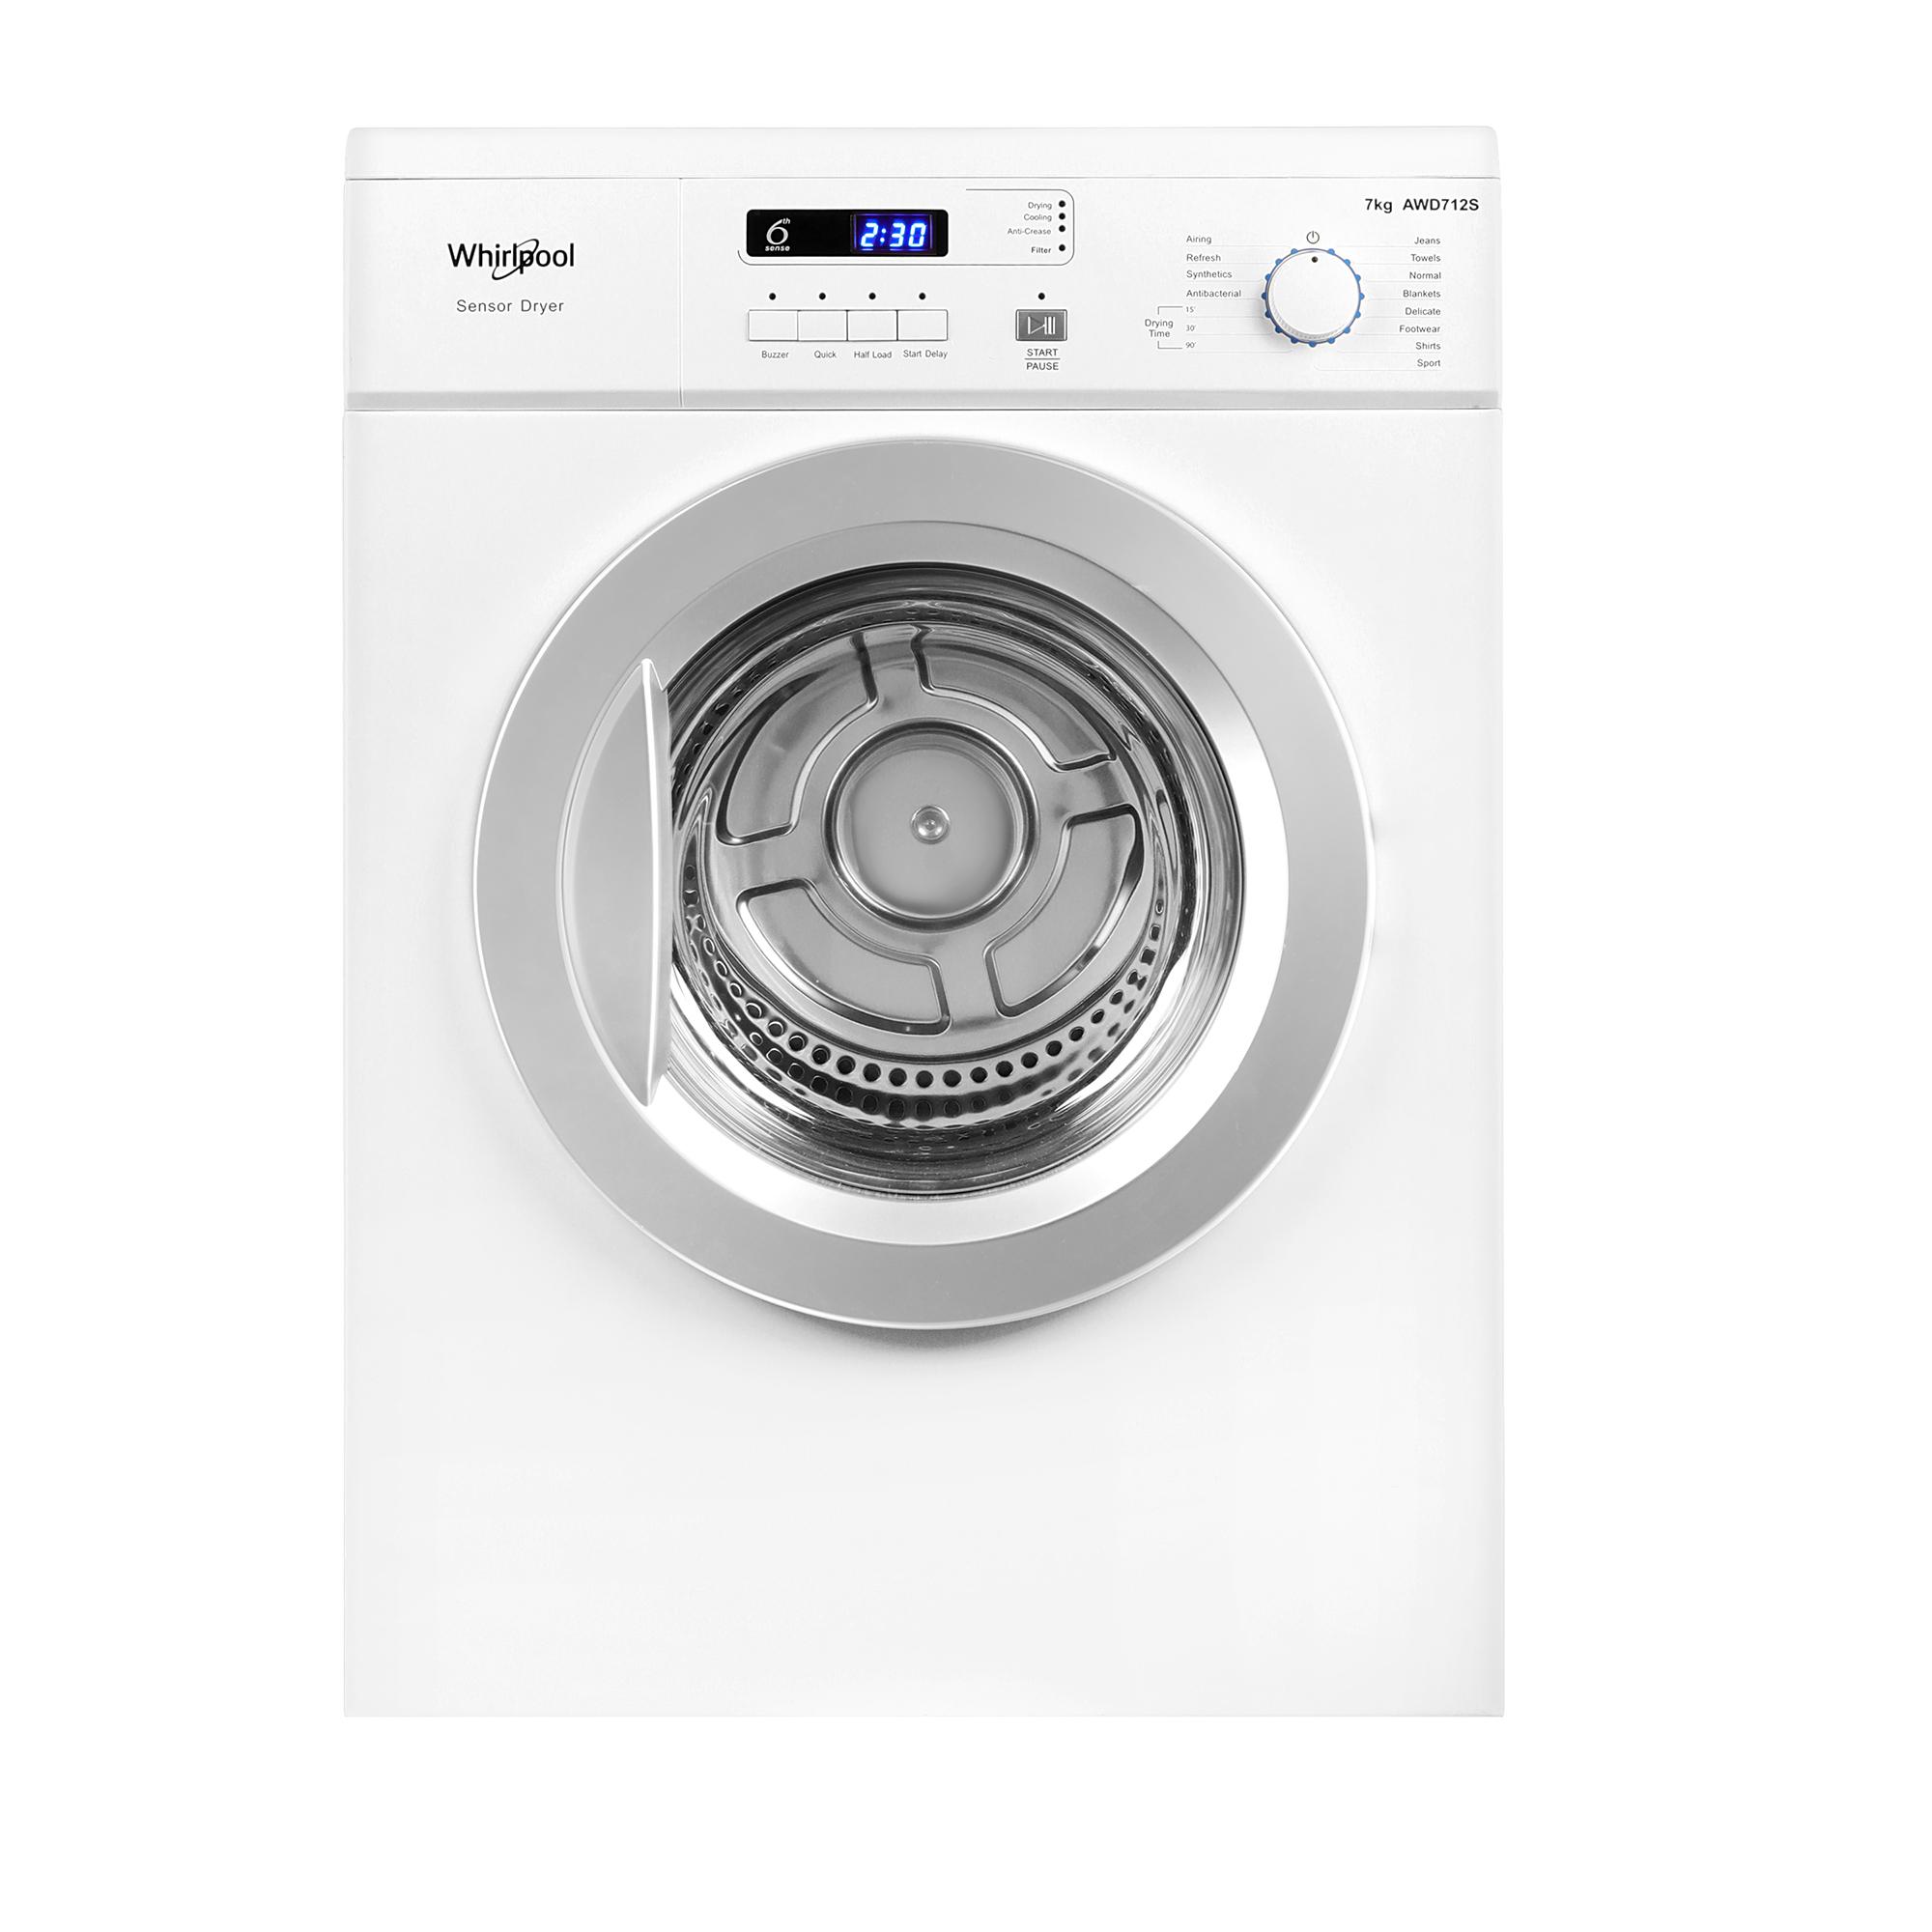 7kg, Air-Vented Dryer | Whirlpool Singapore | Home appliances | Kitchen  appliances | Electrical Appliances